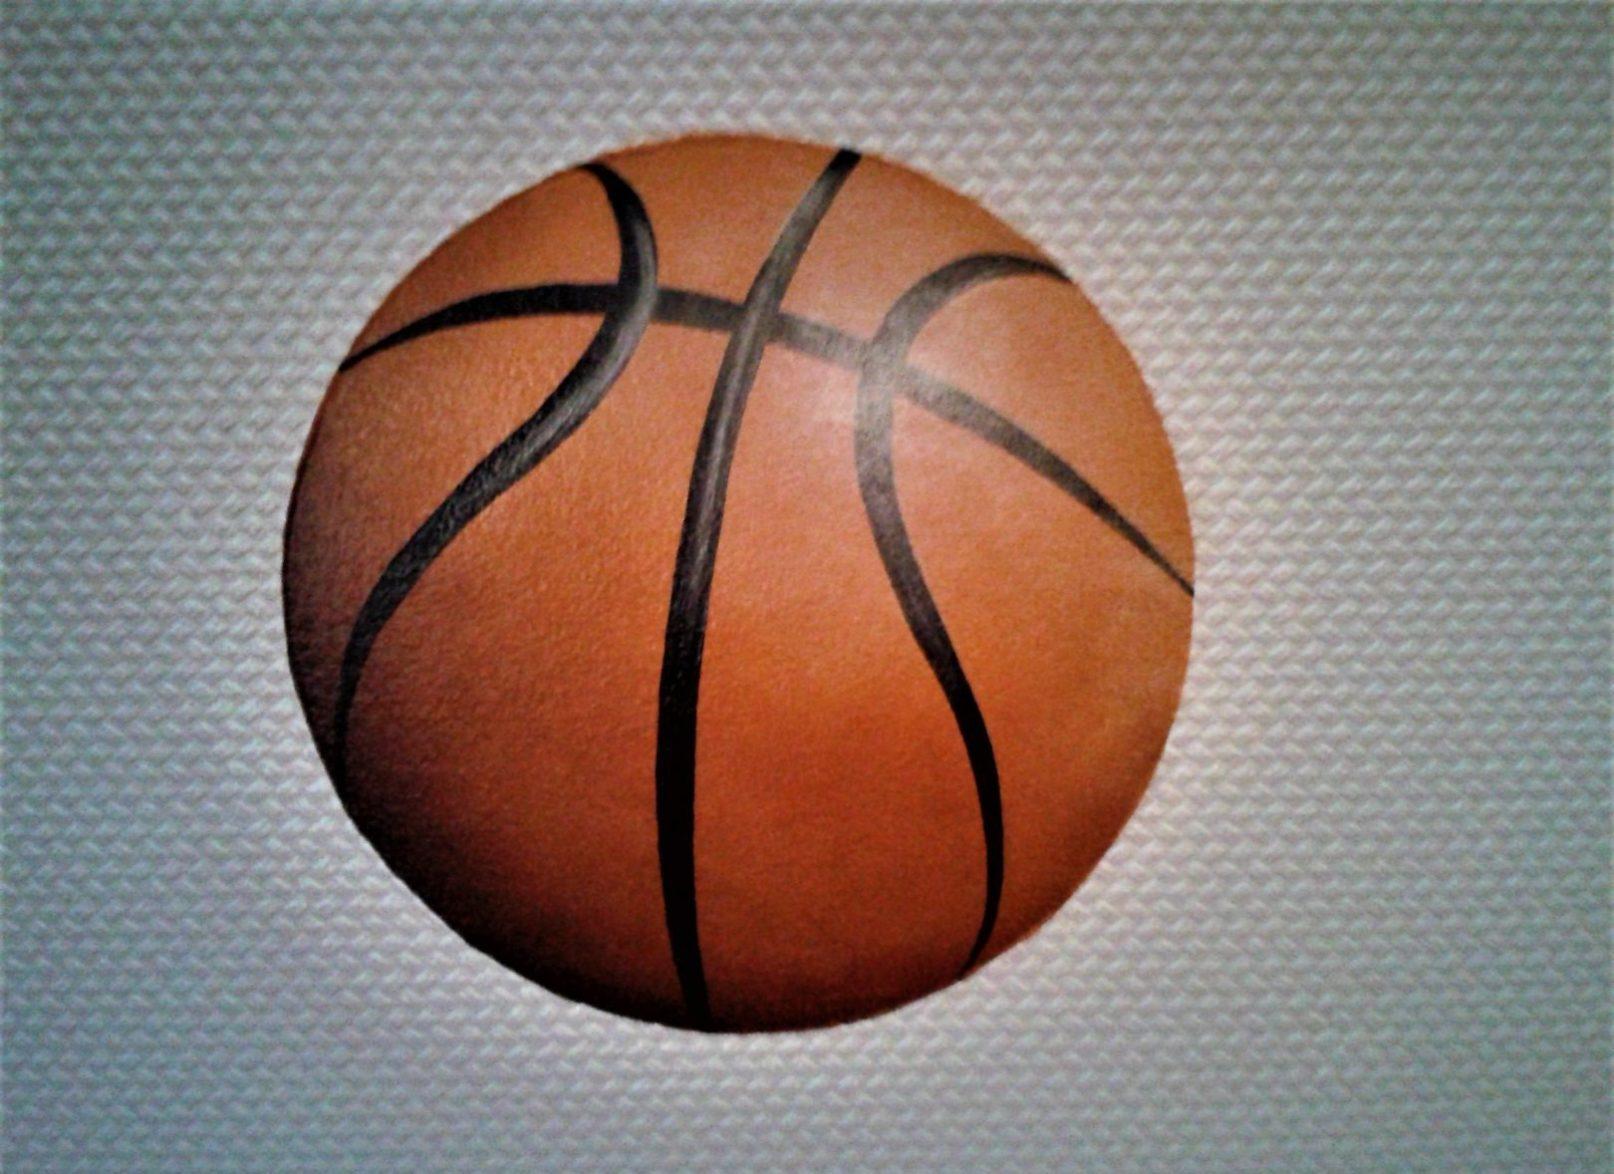 ballon basket 01